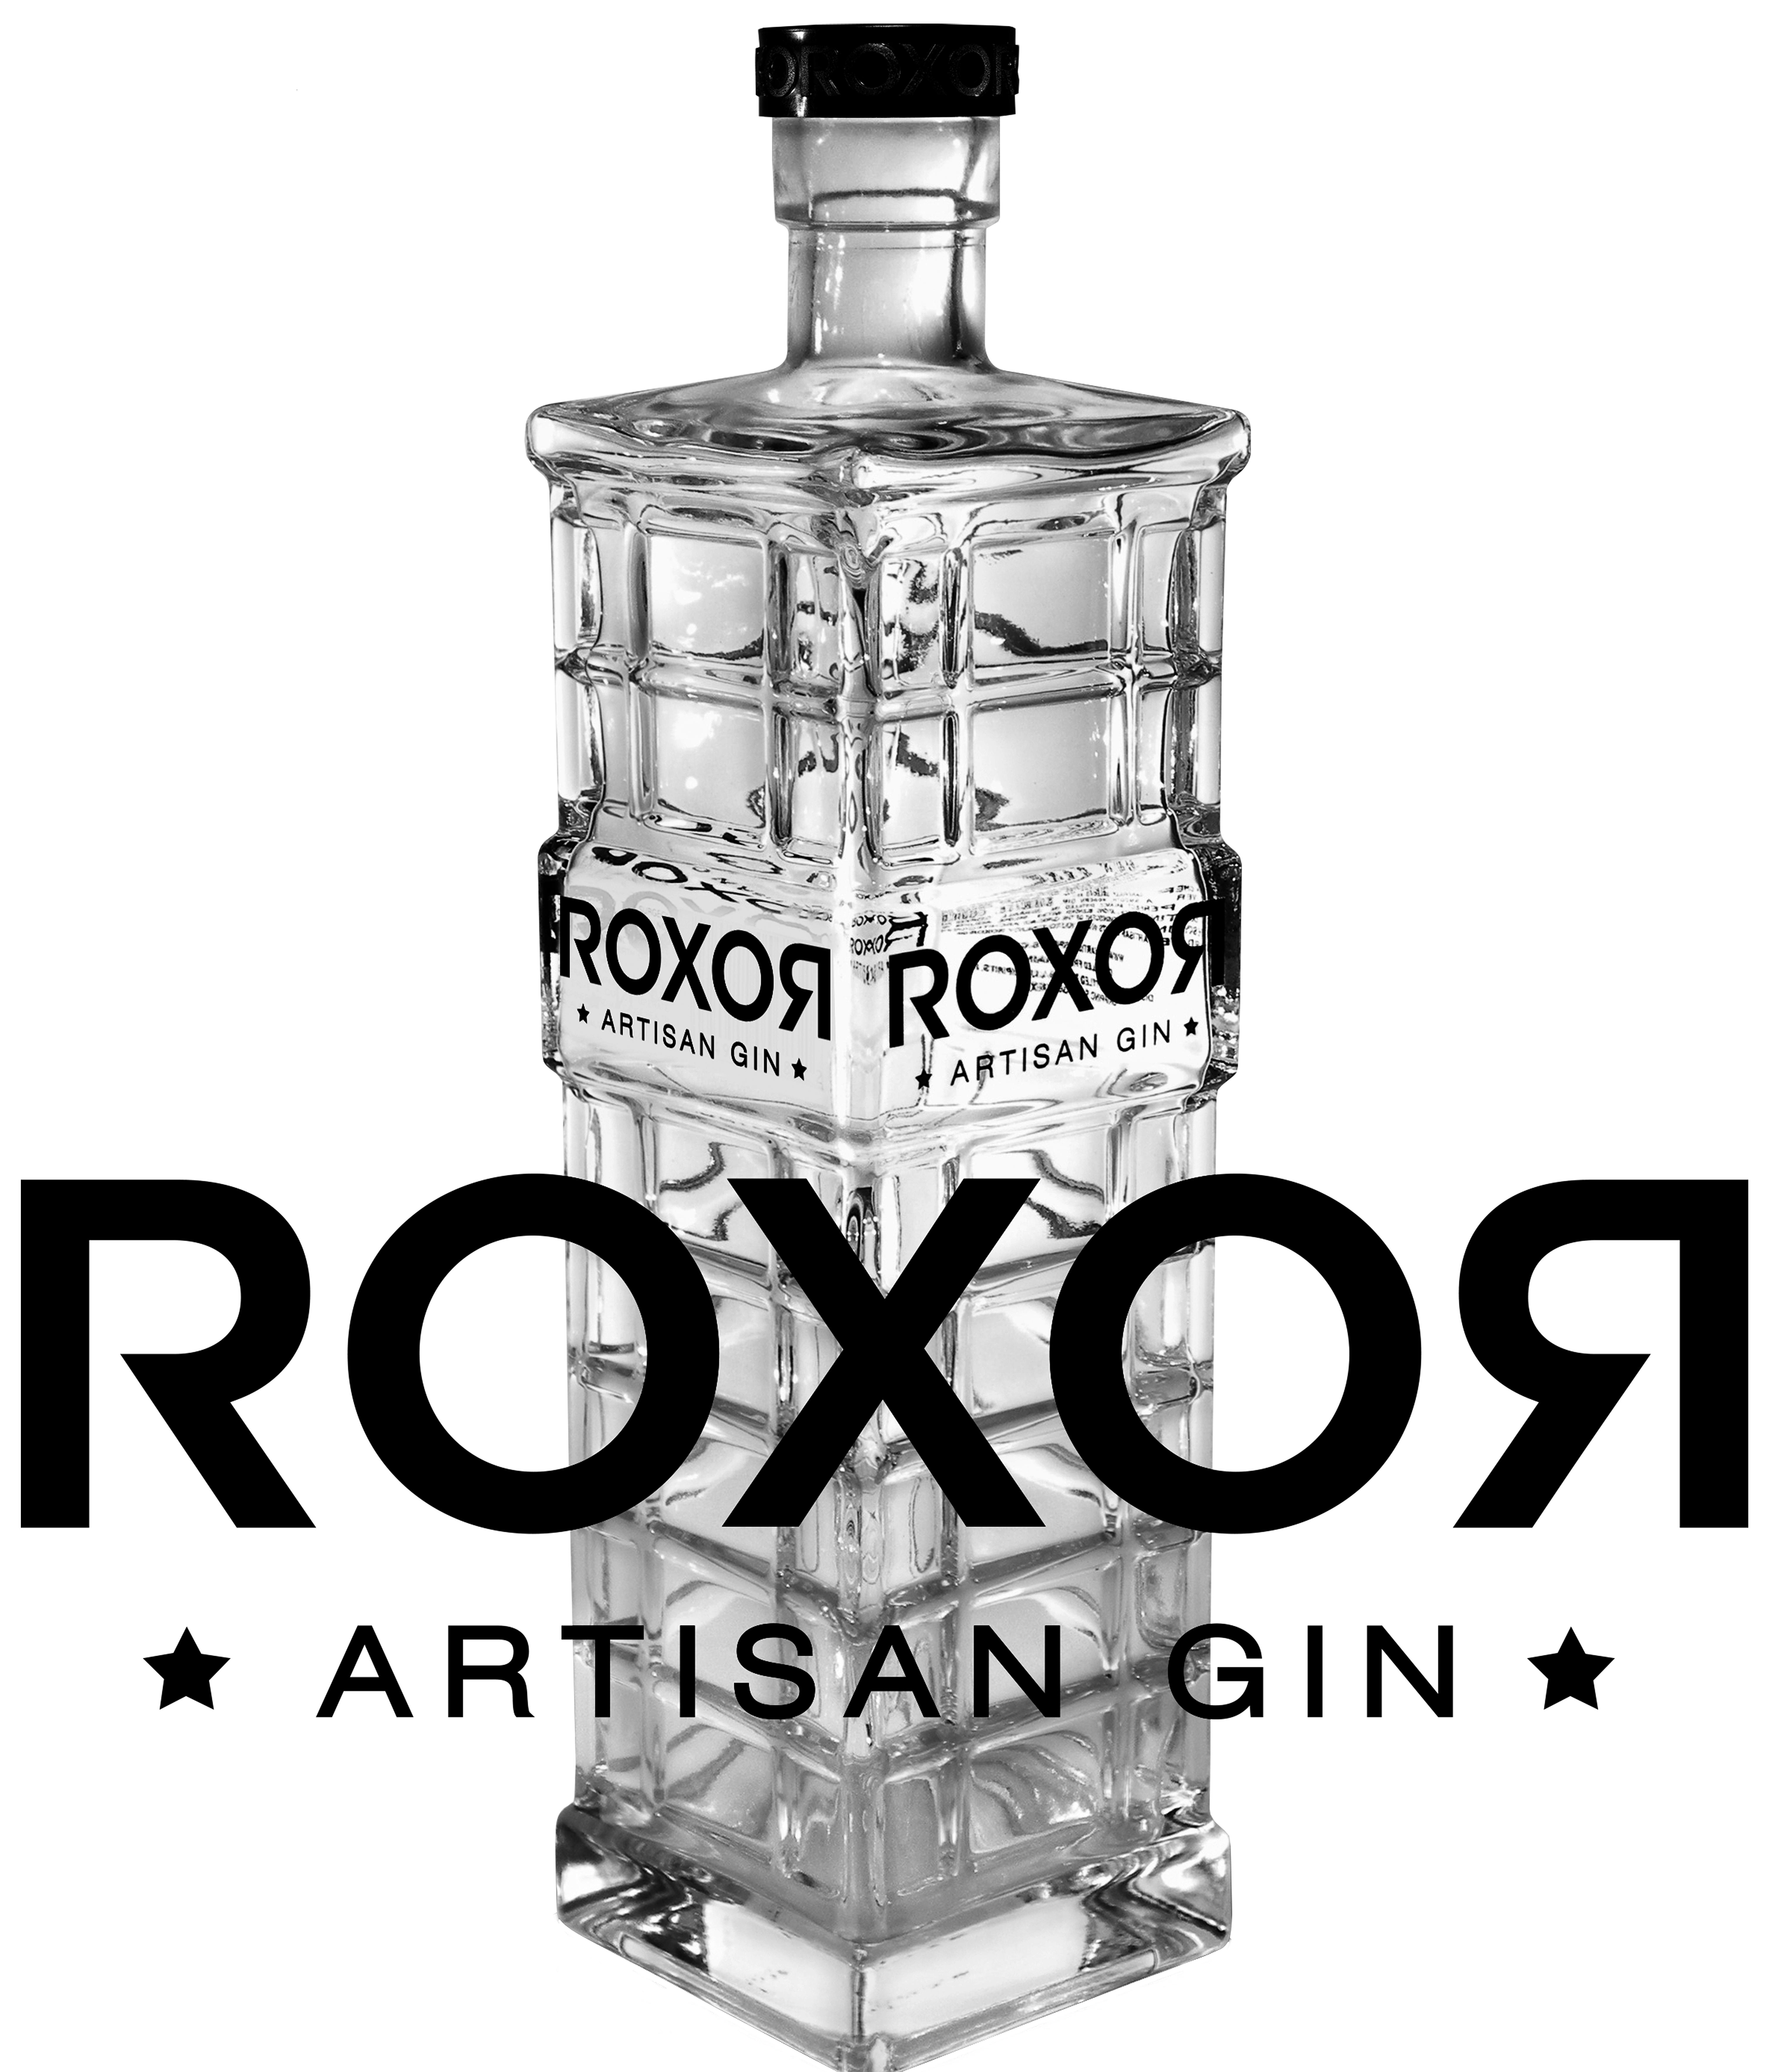 ROXOR Artisan Gin